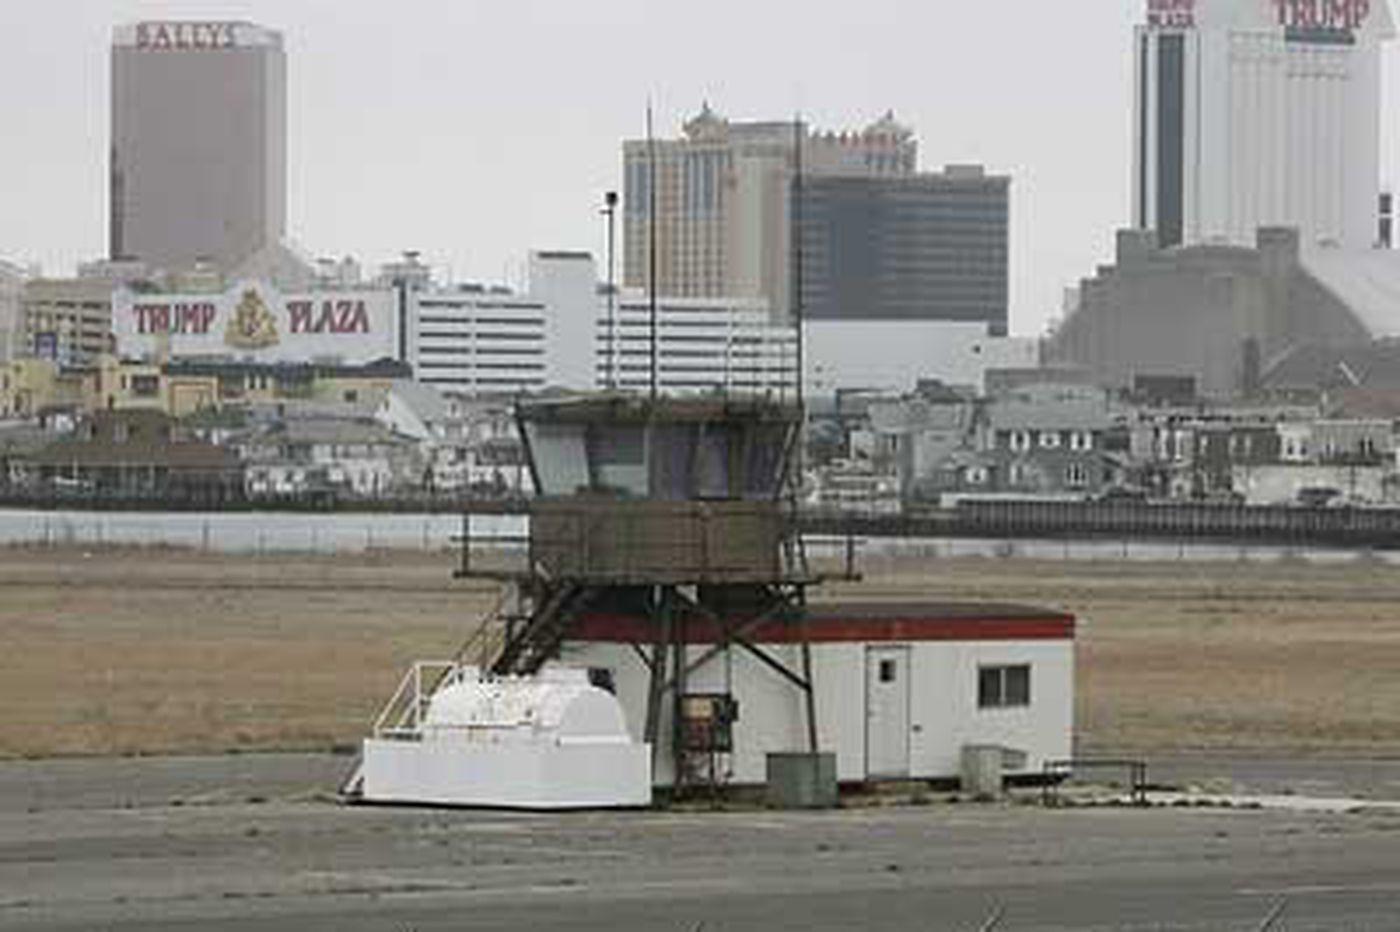 Bidding starts Tuesday for Atlantic City's Bader Field